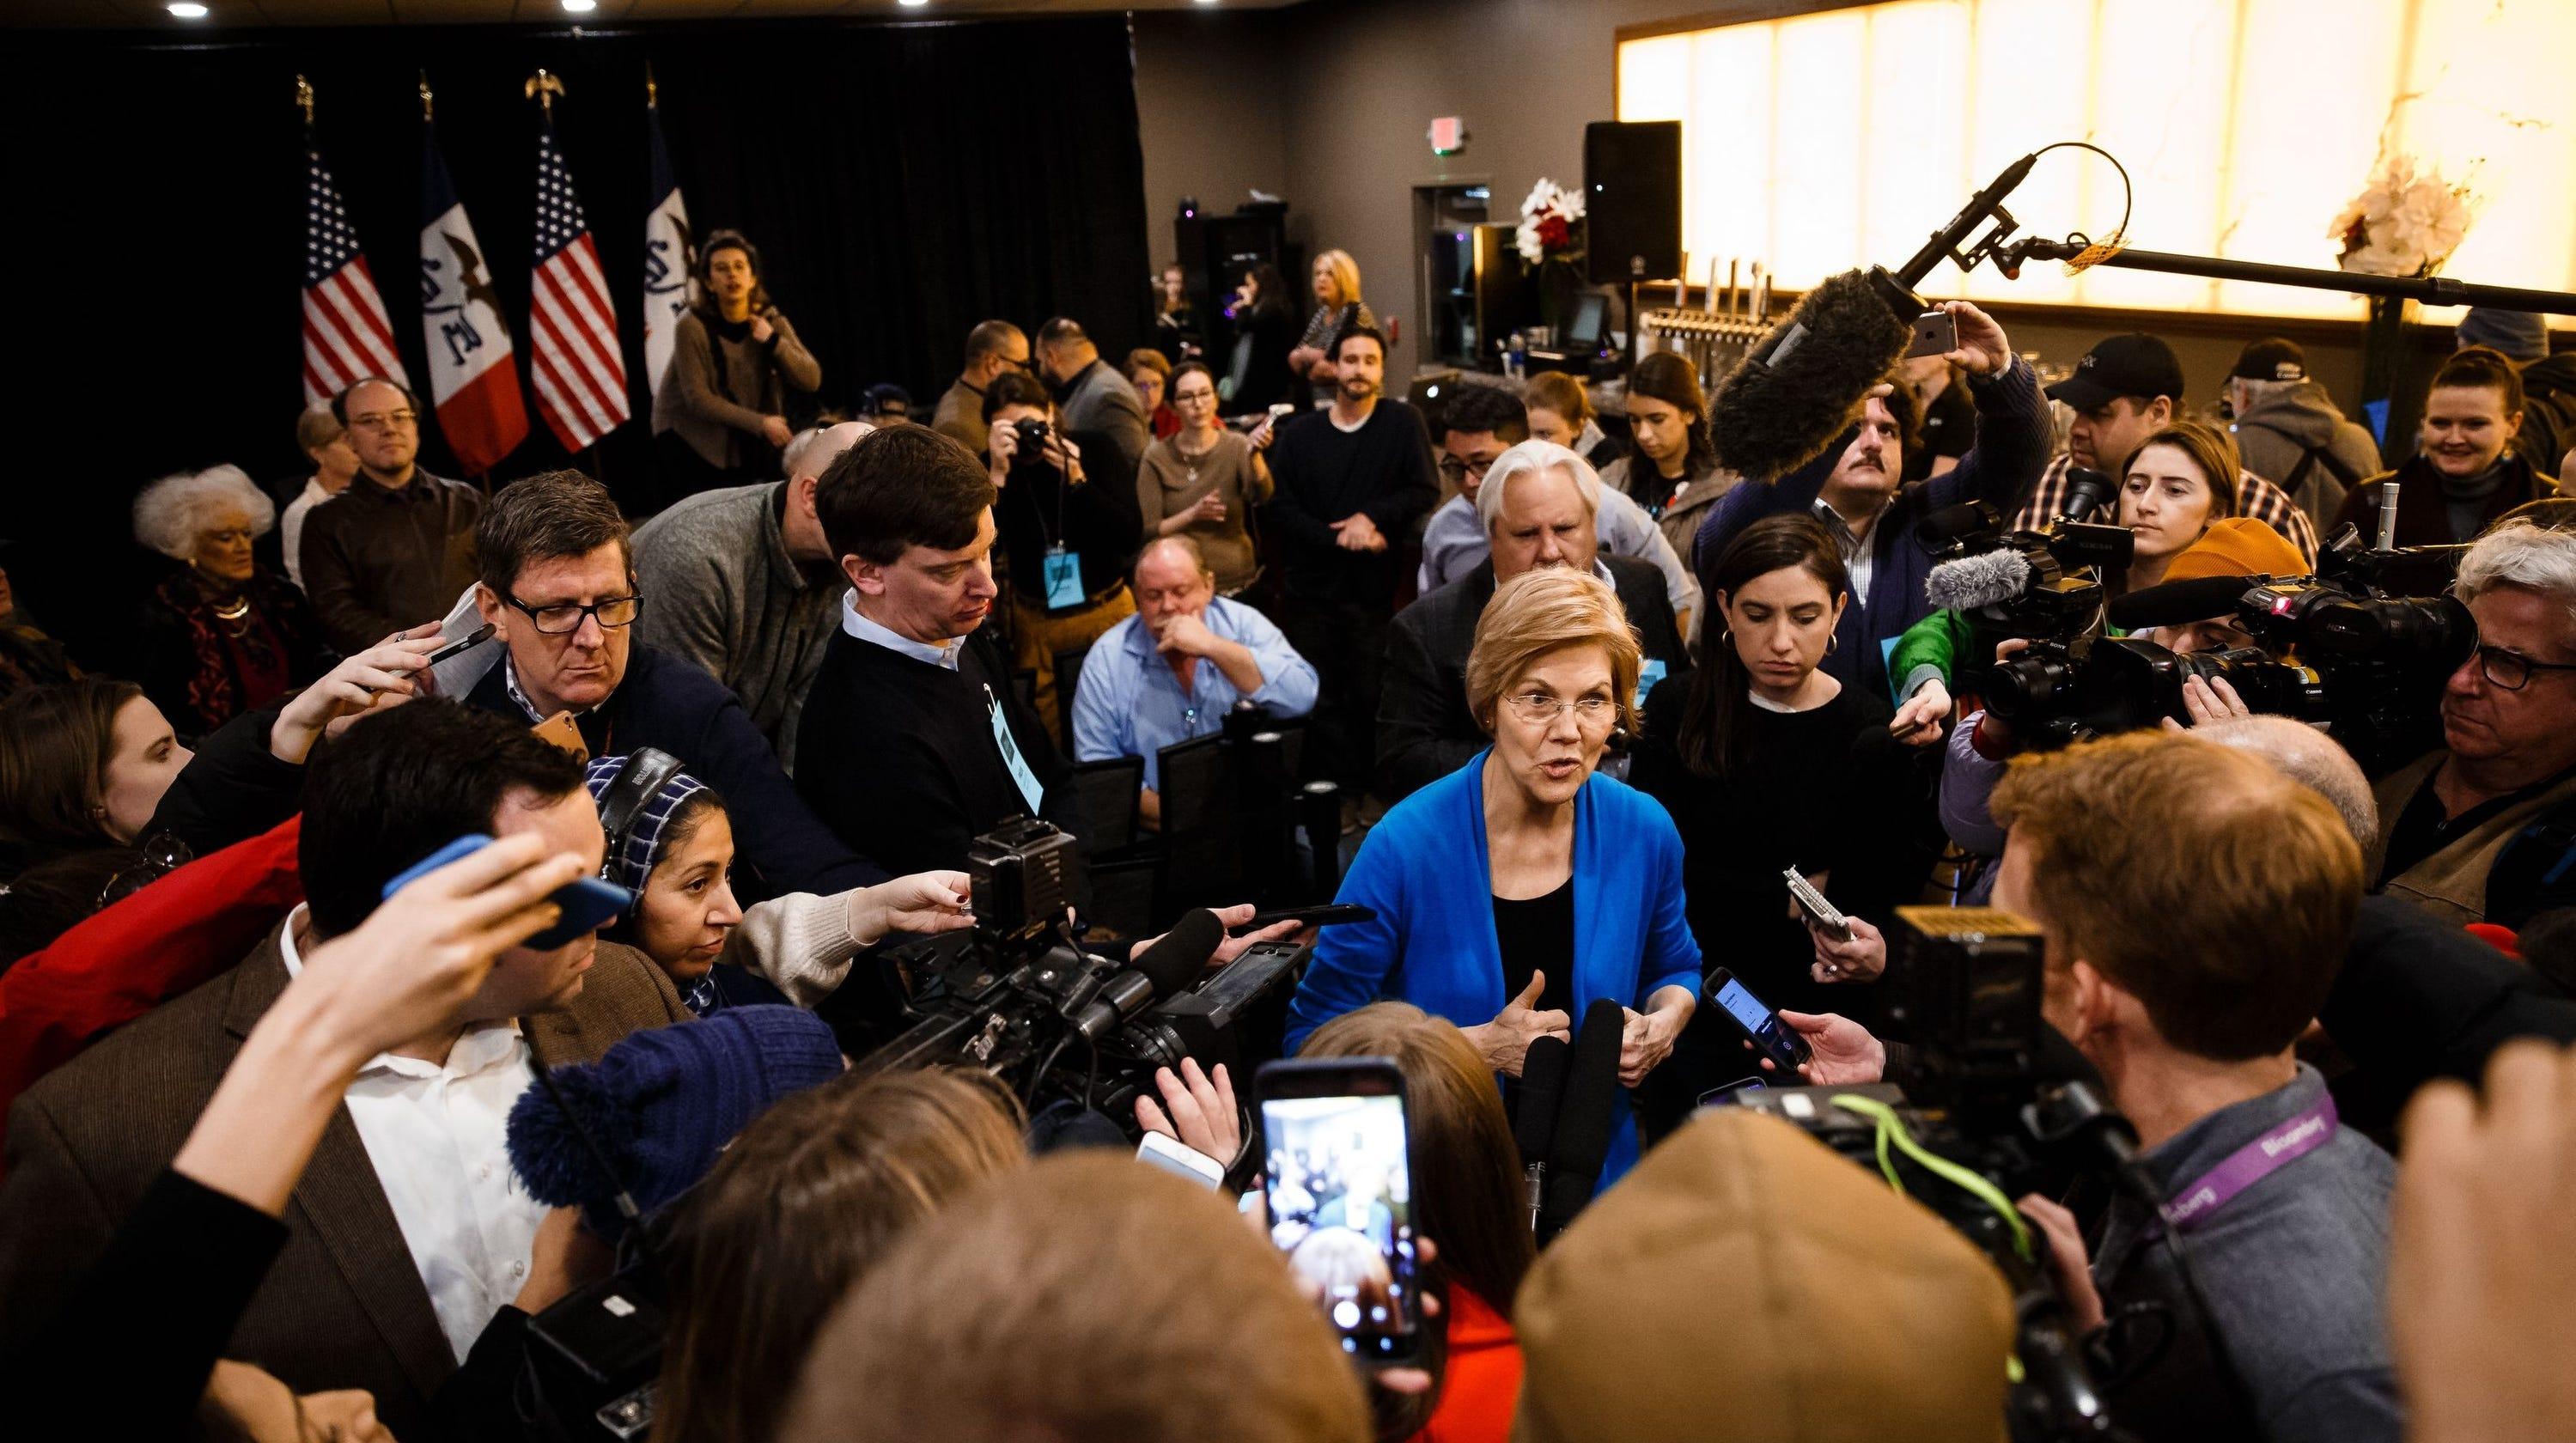 Elizabeth Warren unveils plan to 'break up big tech,' including Amazon, Google, Facebook